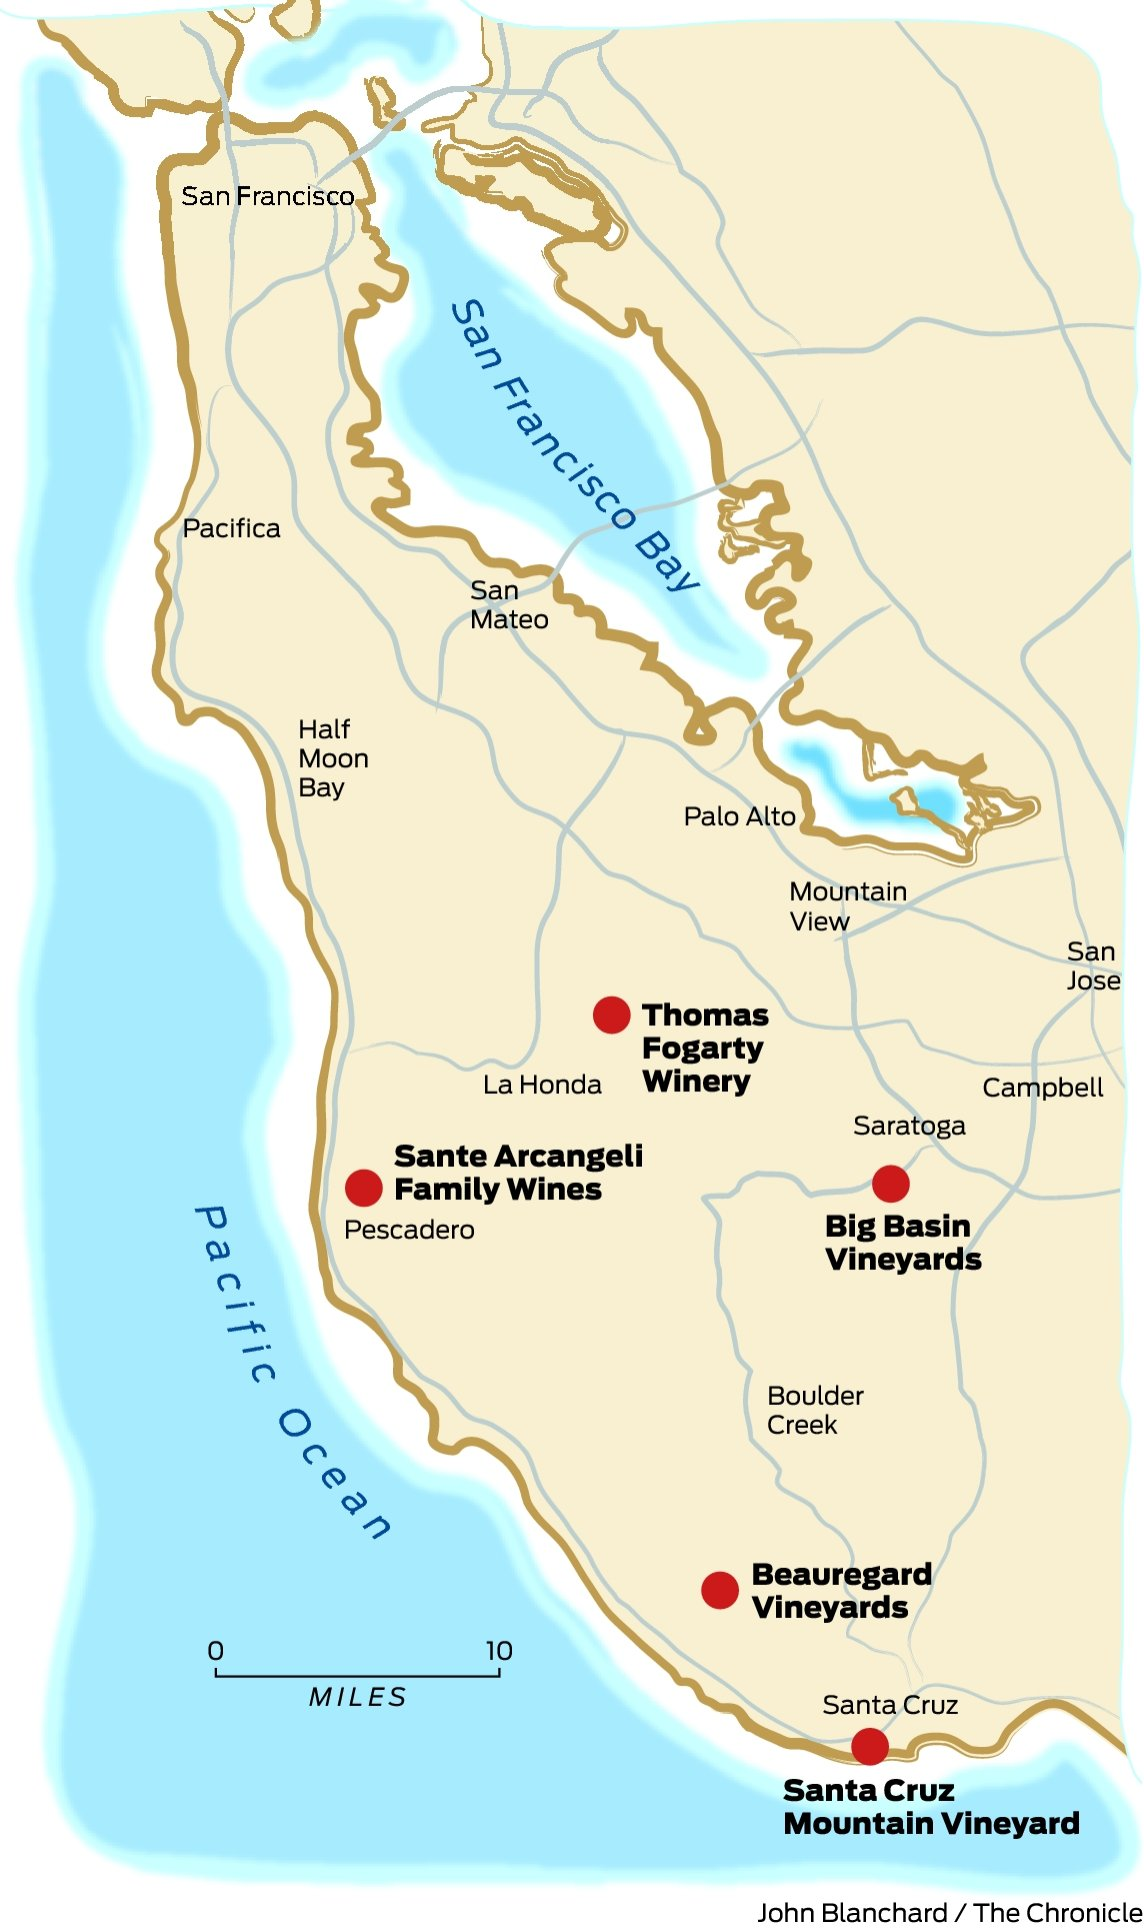 santa cruz wineries map Terroir Speaks For Itself In Santa Cruz Mountains Sfgate santa cruz wineries map